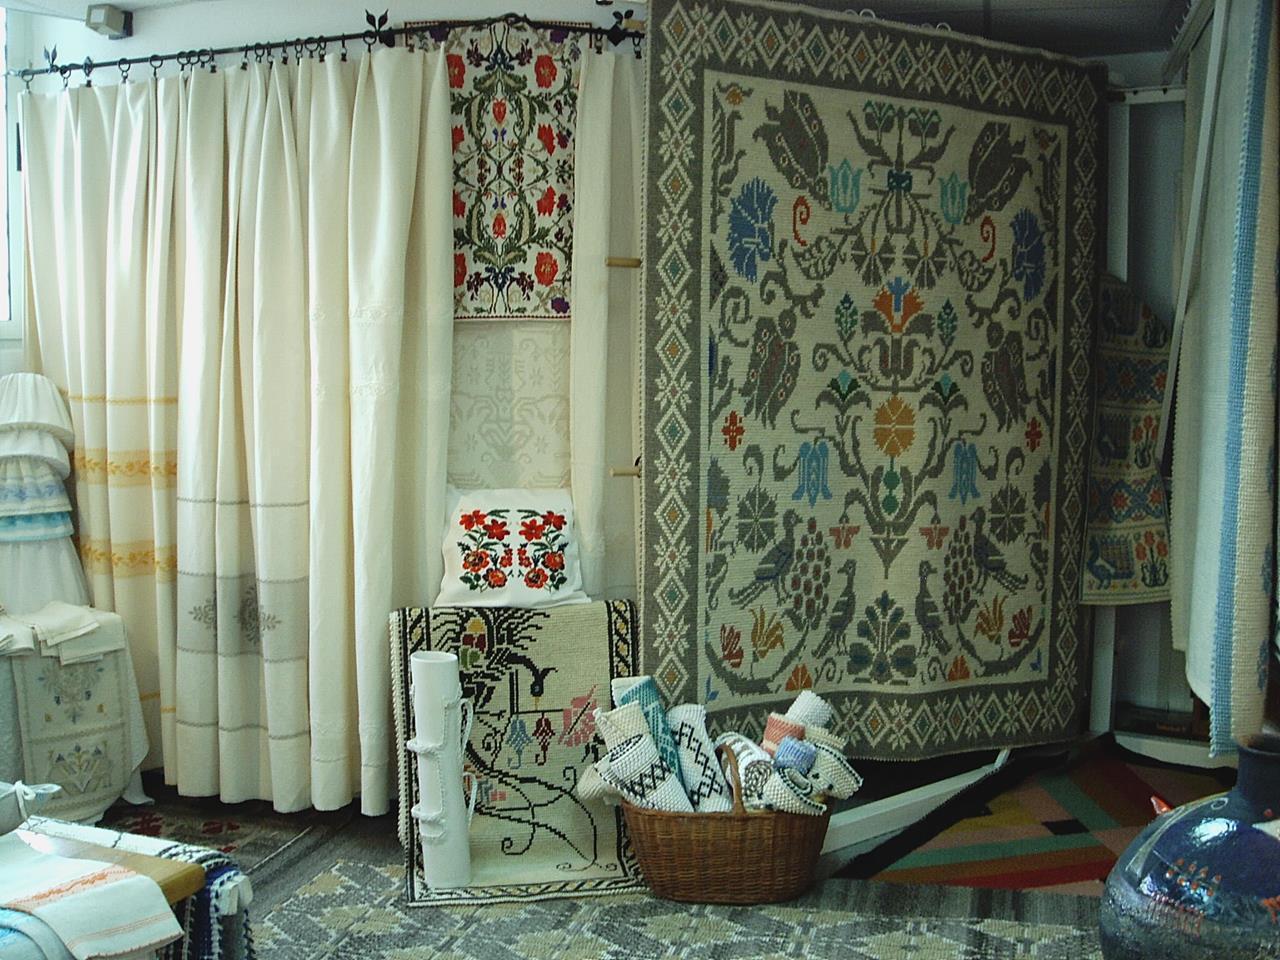 tessart-cogoni-weavers-and-fabric-decorators-villamassargia-carbonia-iglesias-thumbnail